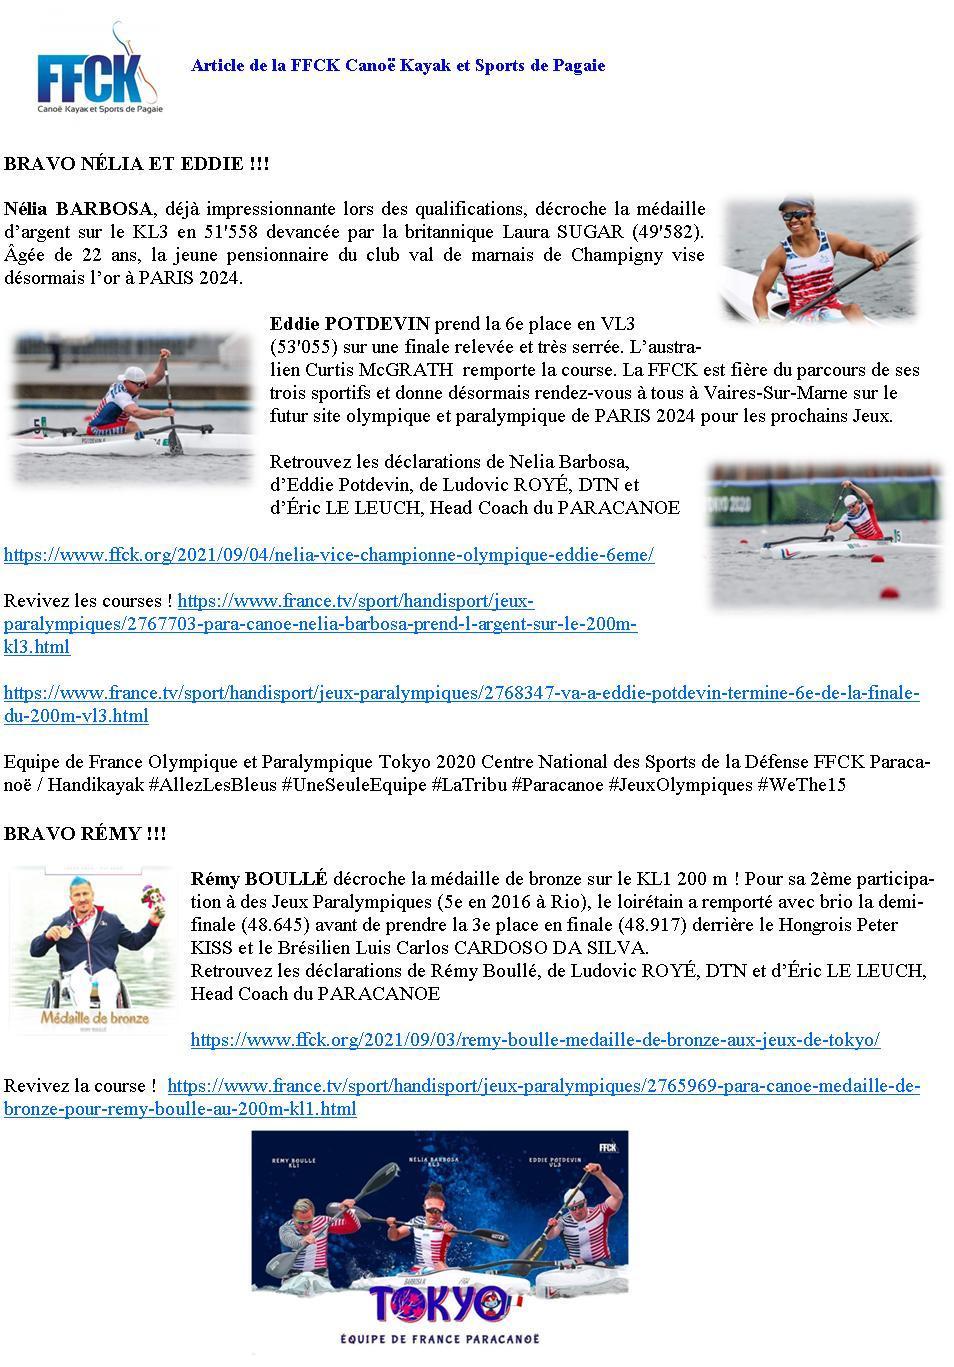 Article de ffck canoe kayak et sport de pagaie